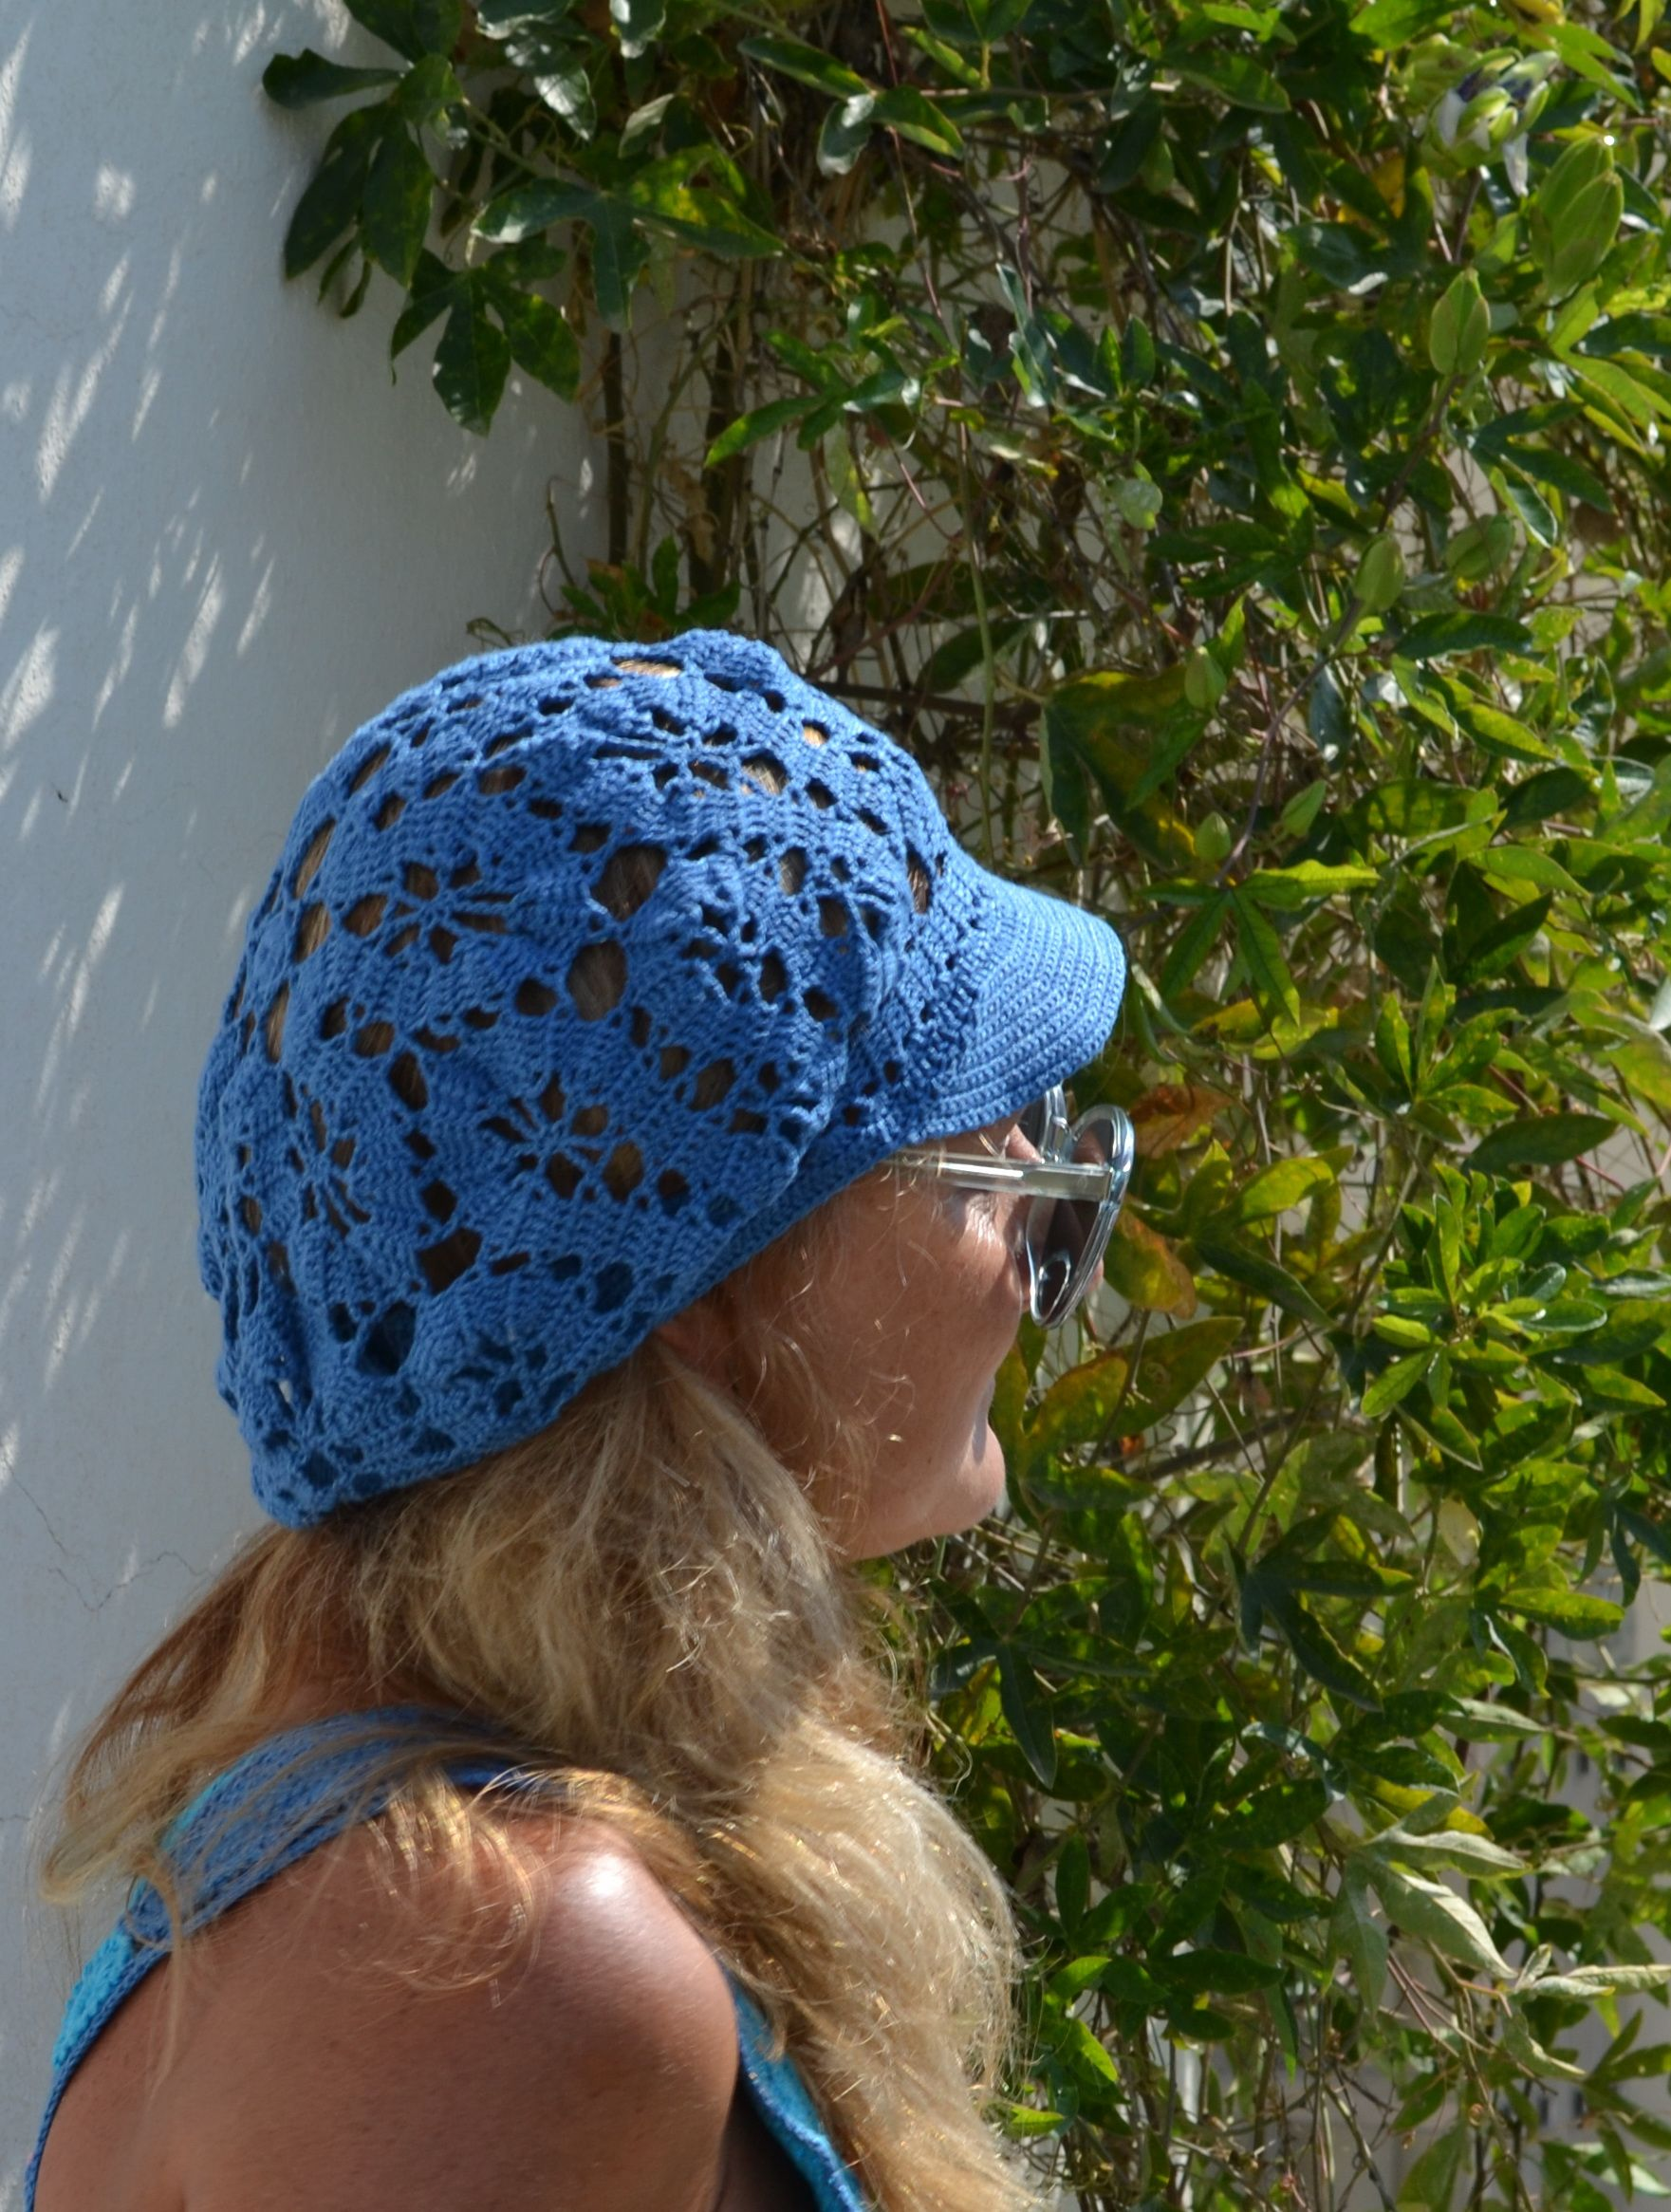 Crochet Cotton Brim Cap Beret visor Summer Slouchy Textured Mesh Brugge  lace style Newsboy Knit Cap  5ec307f94f94